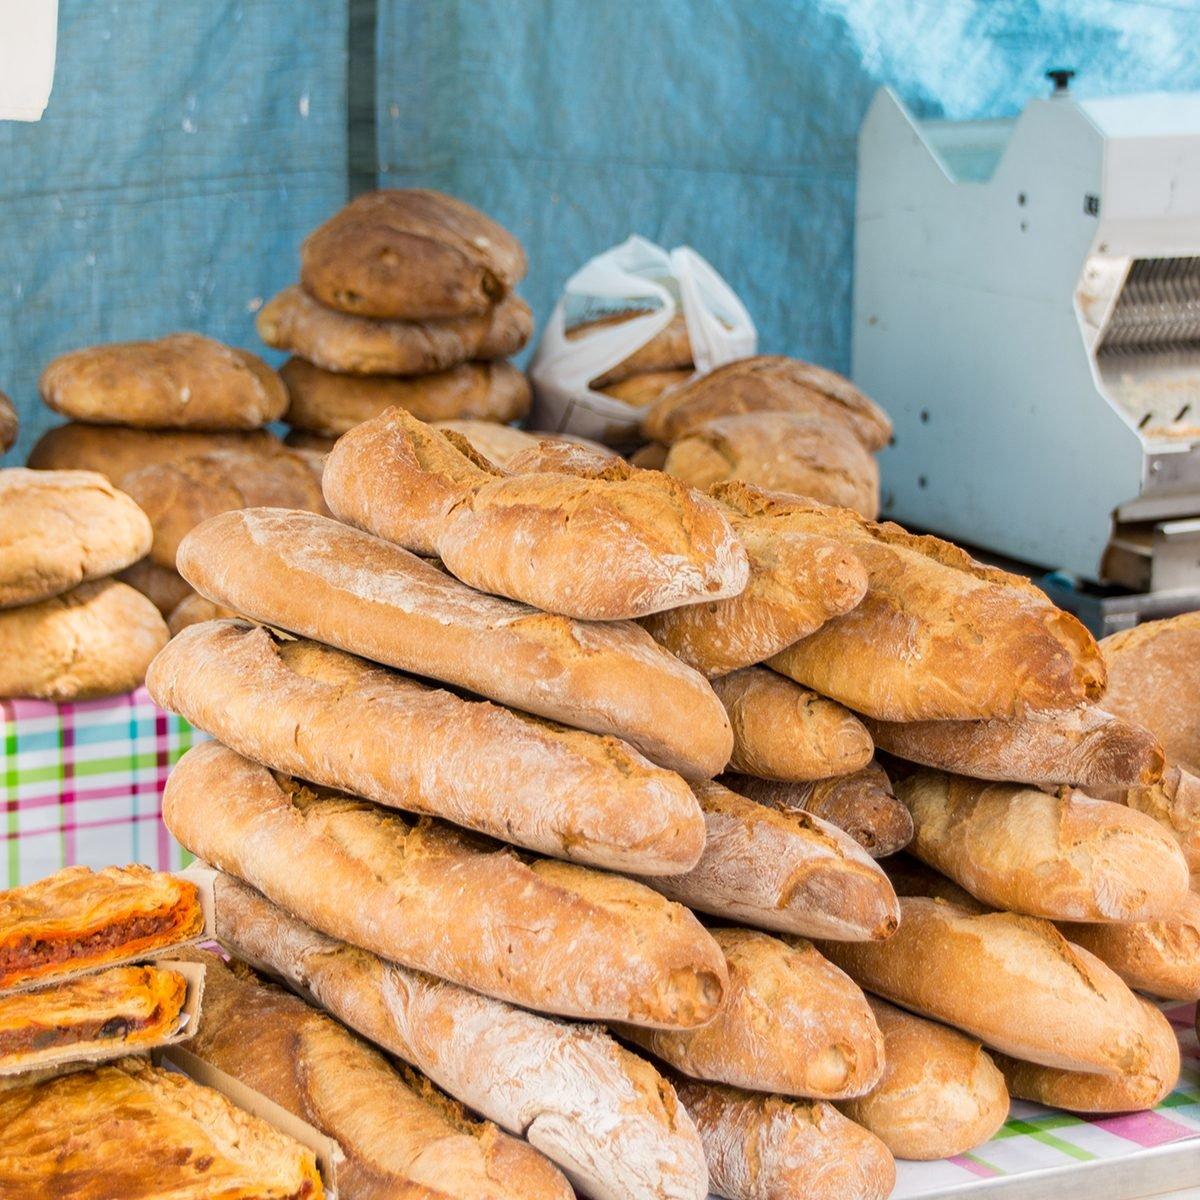 Fresh baked bread - Farmer's Market, Potes, Spain